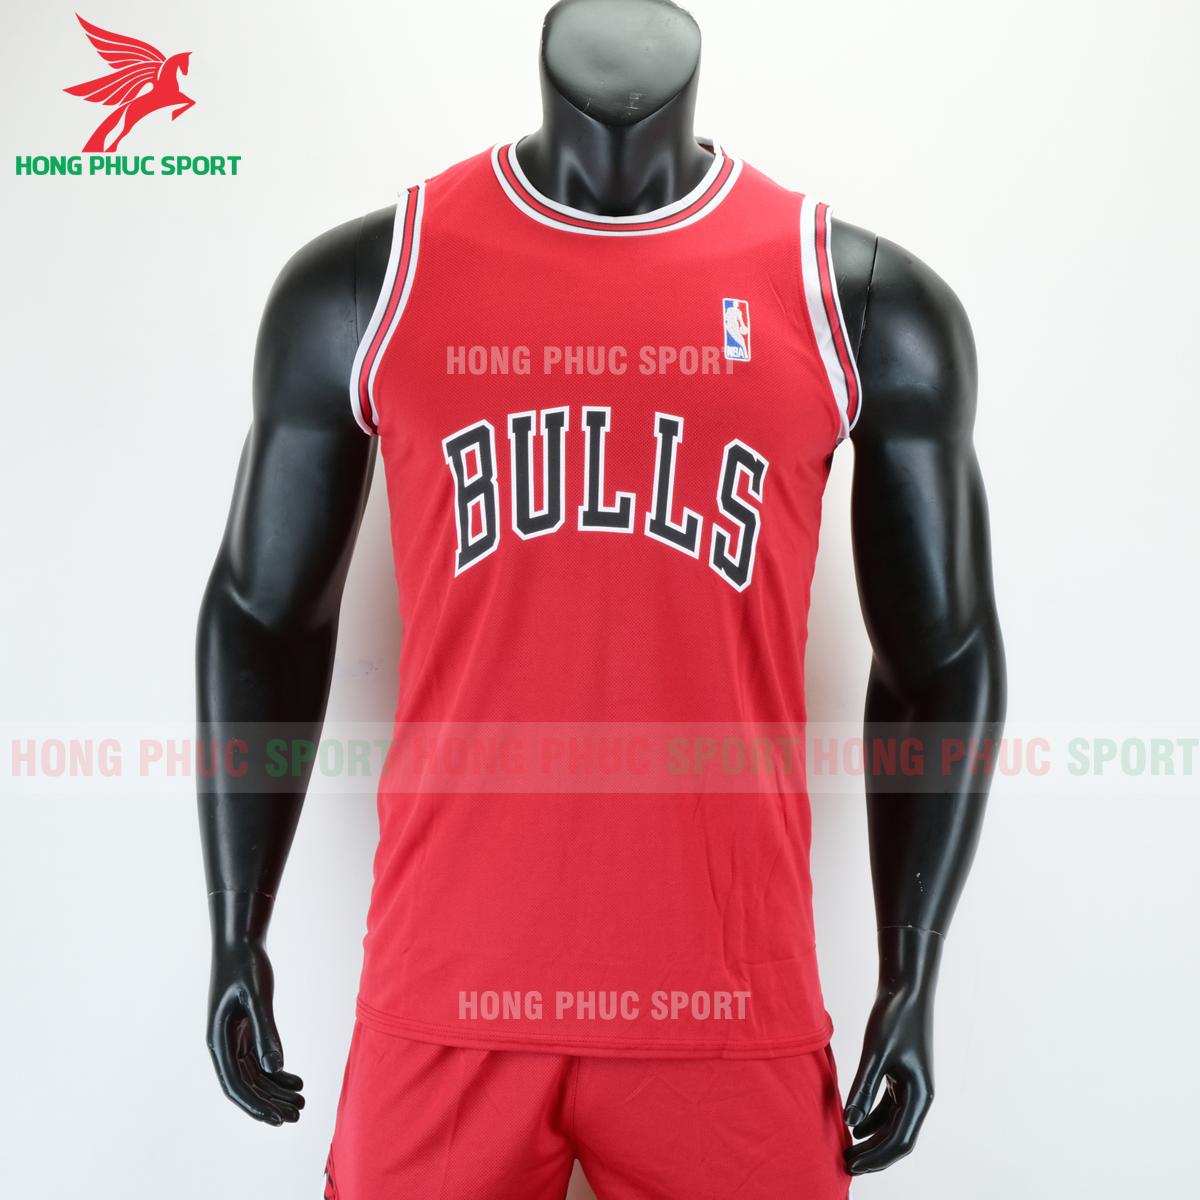 https://cdn.hongphucsport.com/unsafe/s4.shopbay.vn/files/285/ao-bong-ro-bulls-mau-do-5-5f76dc0324d5a.png